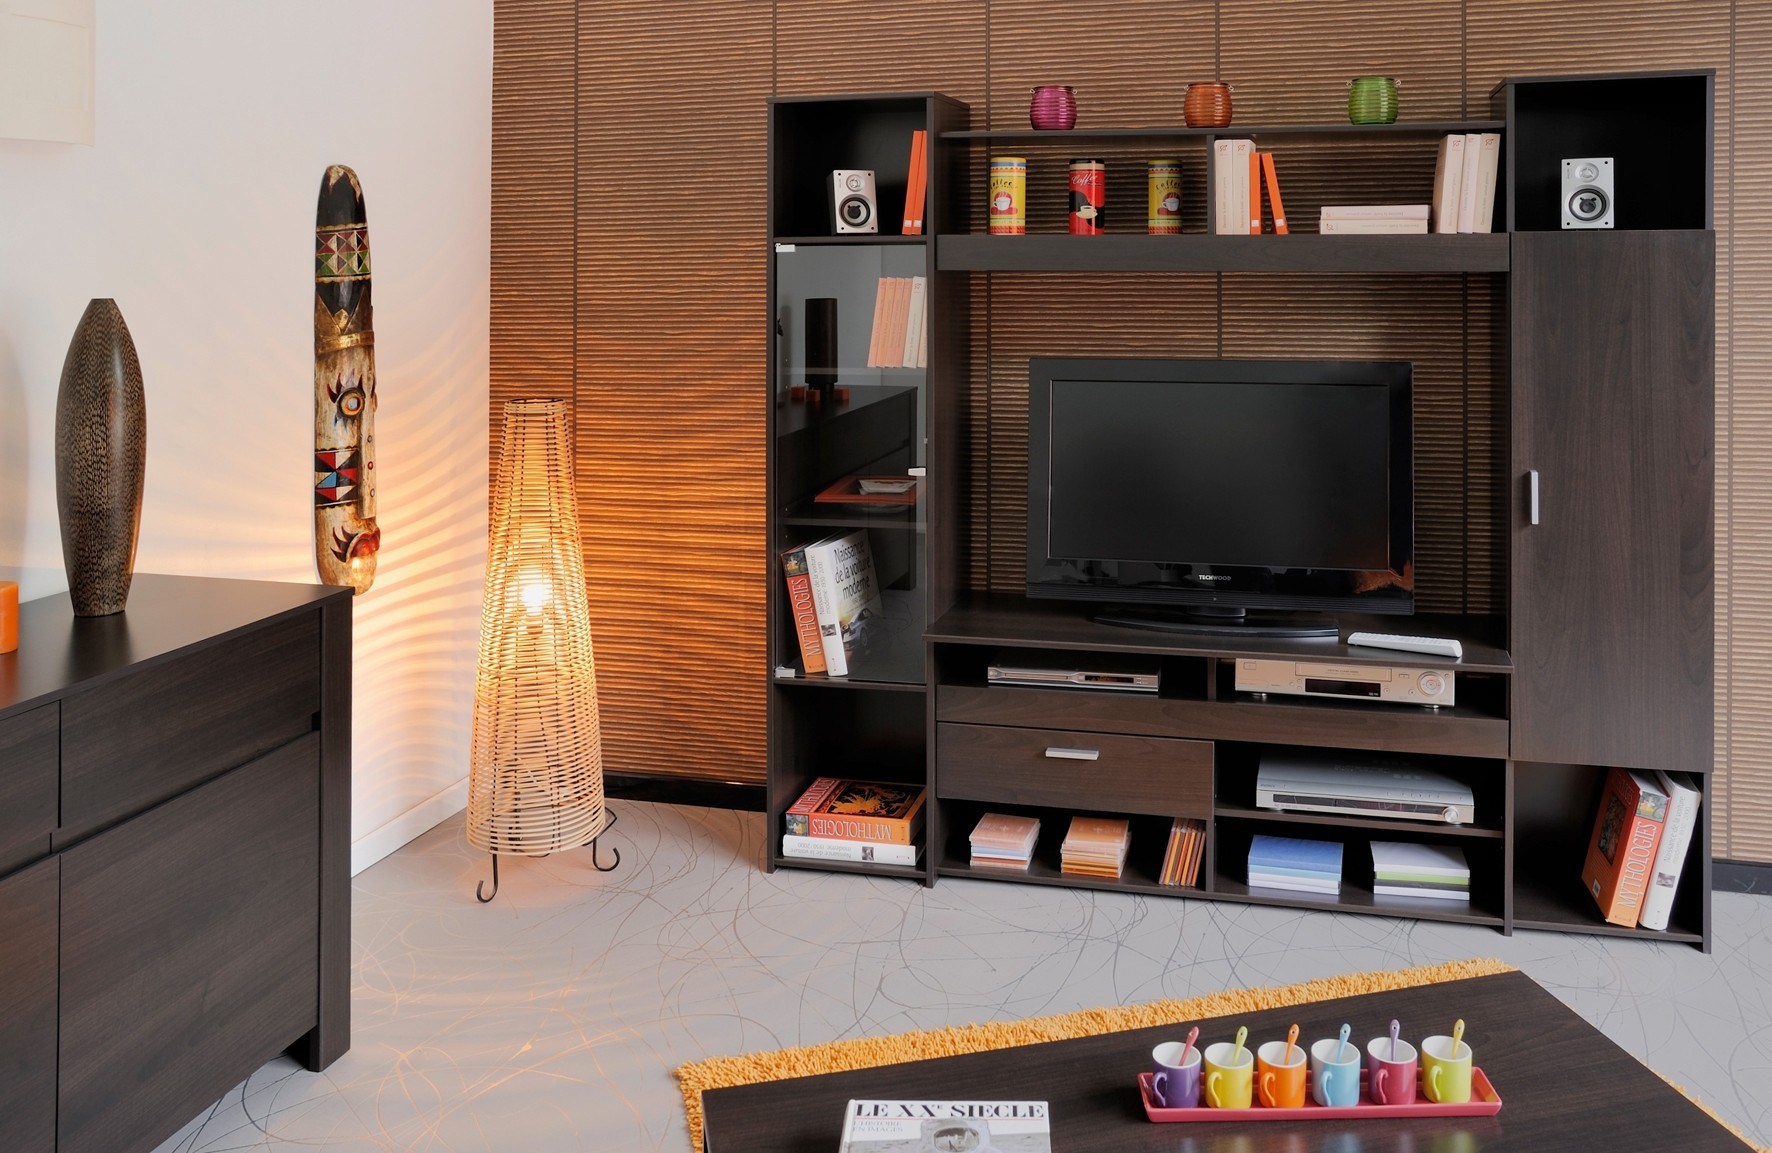 Meuble Tv Soline Teinte Caf Prix Discount # Ensemble Mural Meuble Tv